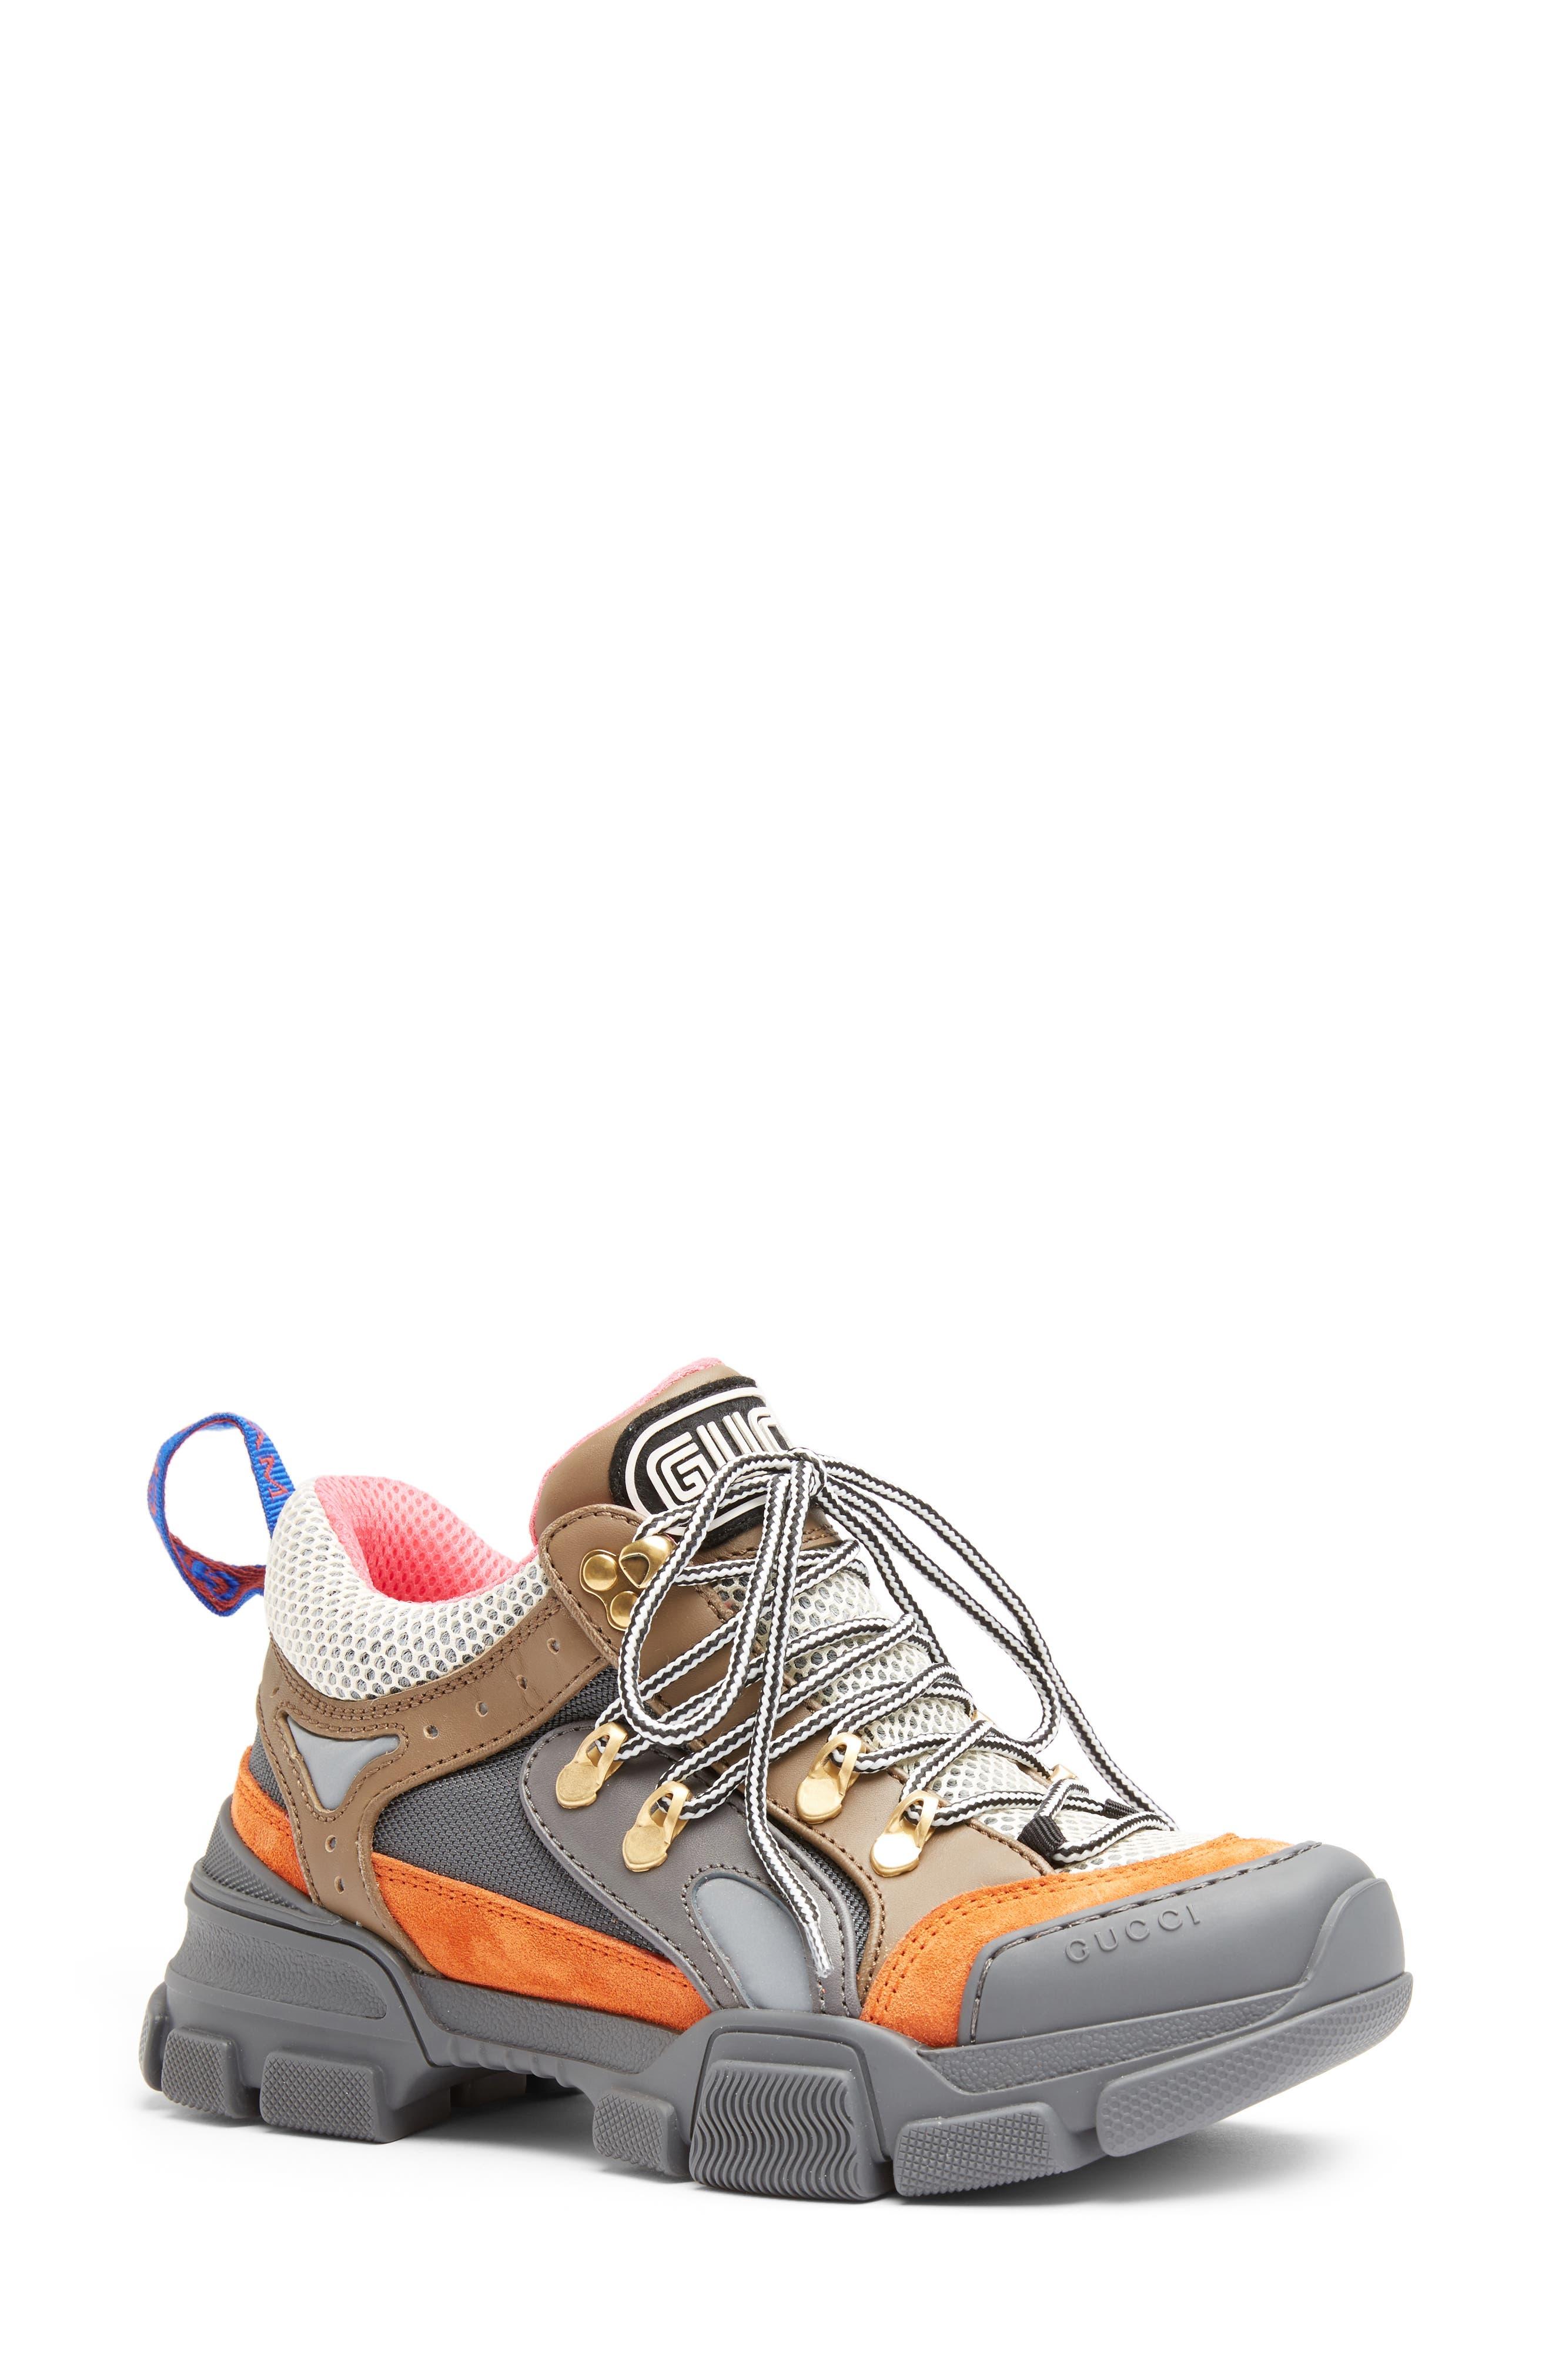 Journey Sneaker,                             Main thumbnail 1, color,                             GREY/ ORANGE